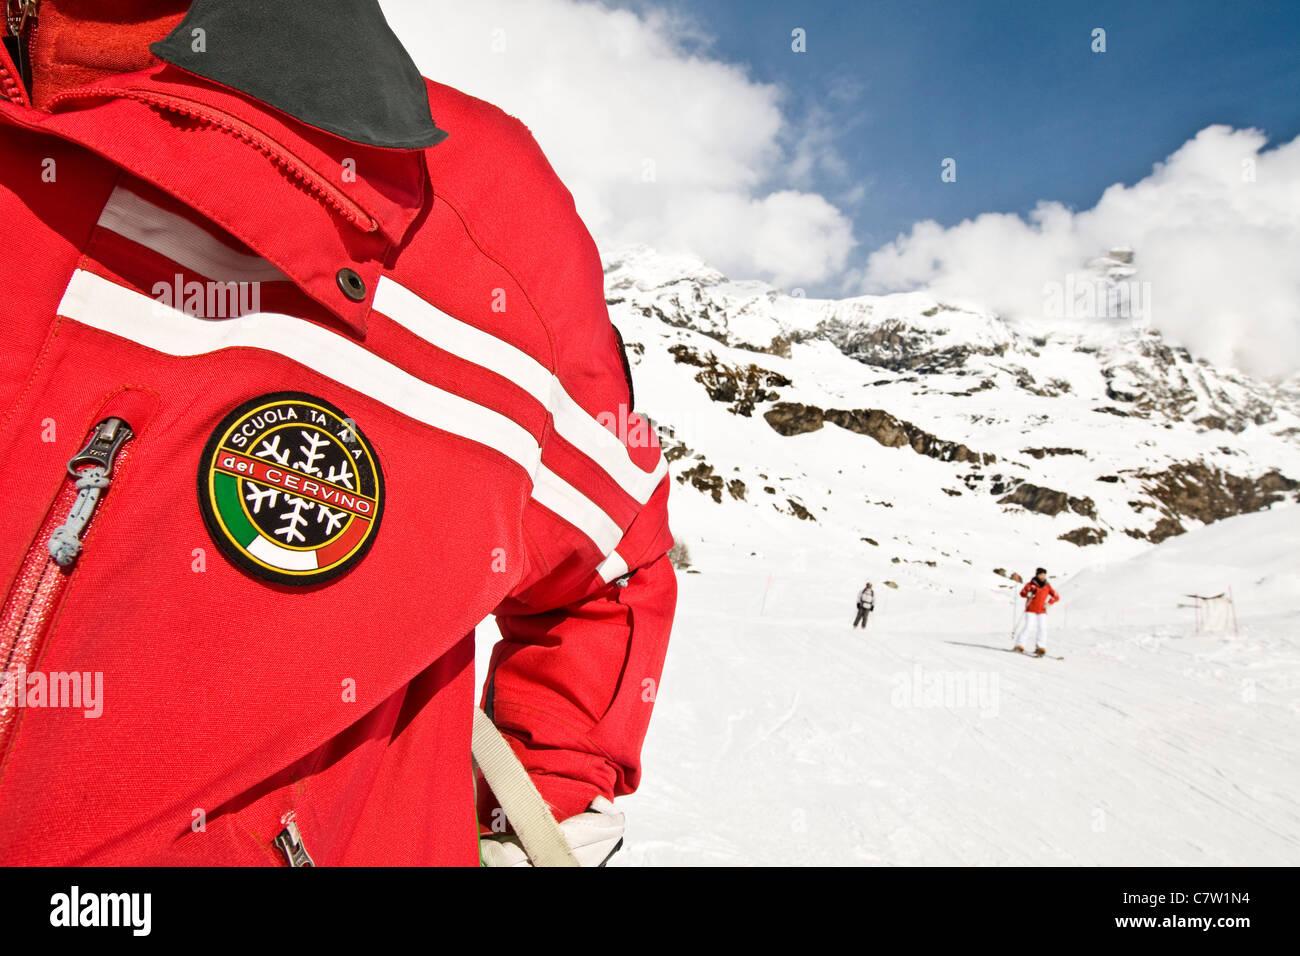 Italy, Aosta Valley, Cervinia, ski instructor - Stock Image